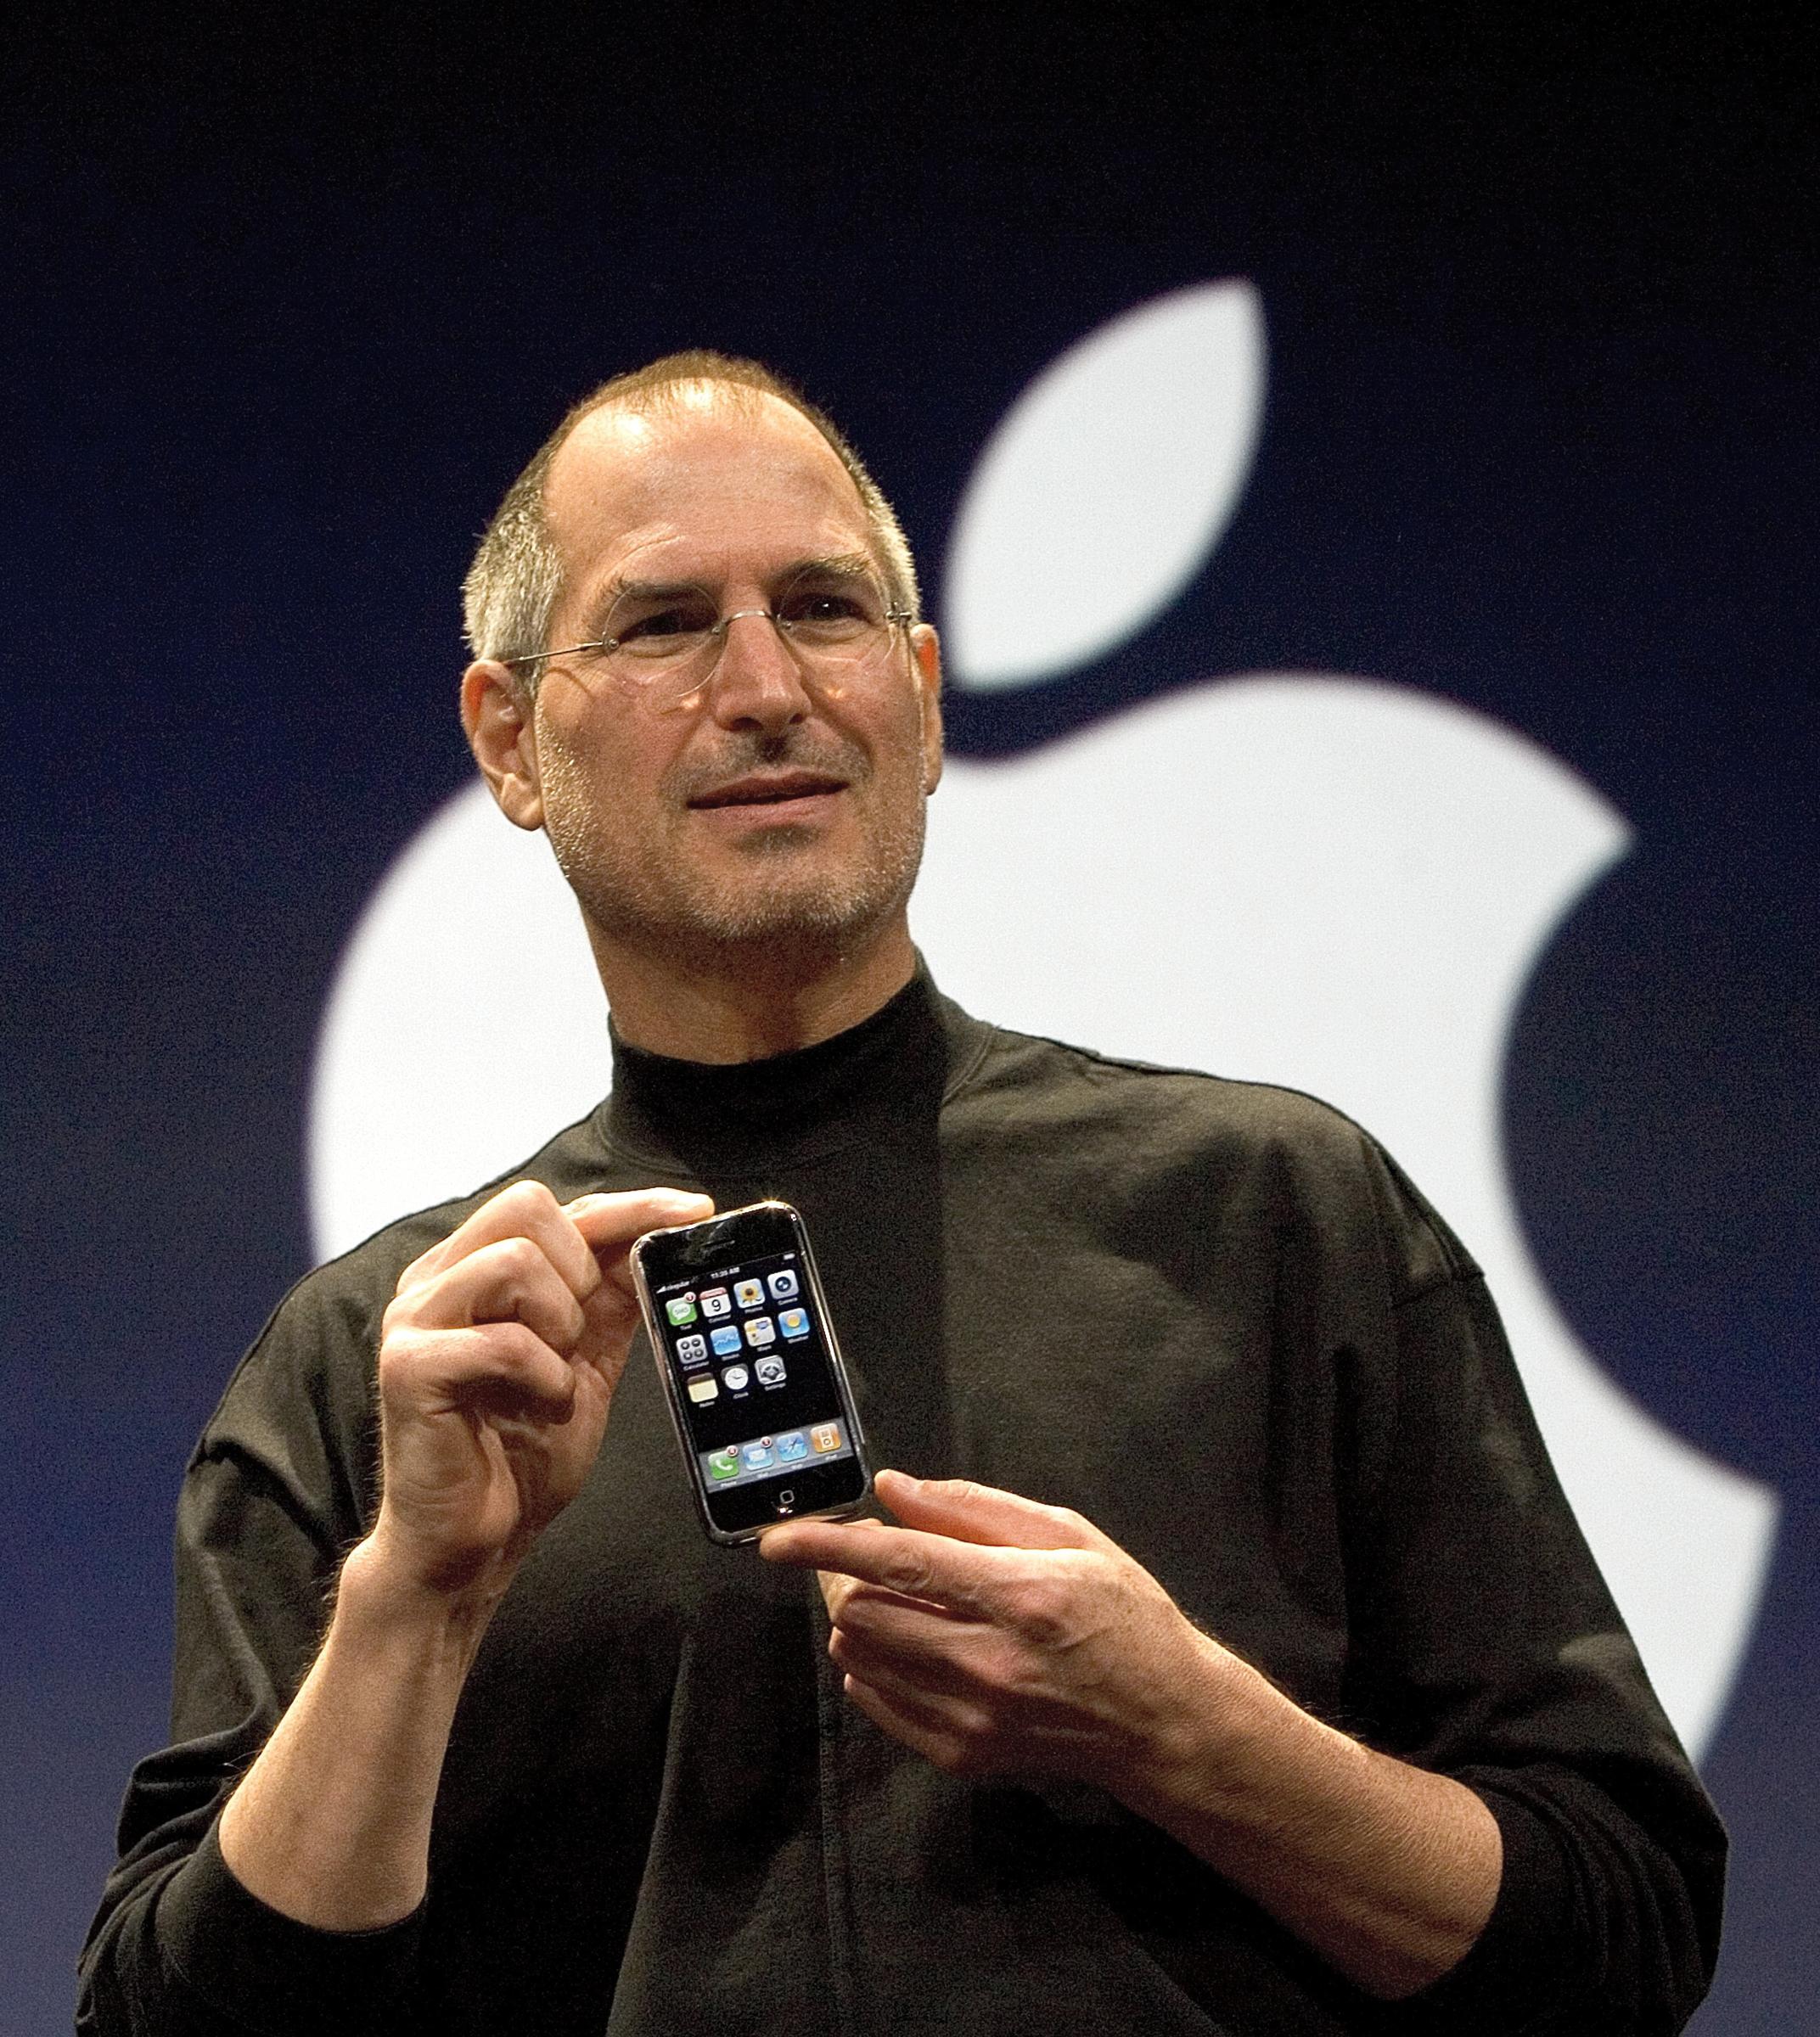 Steve Jobs iphon